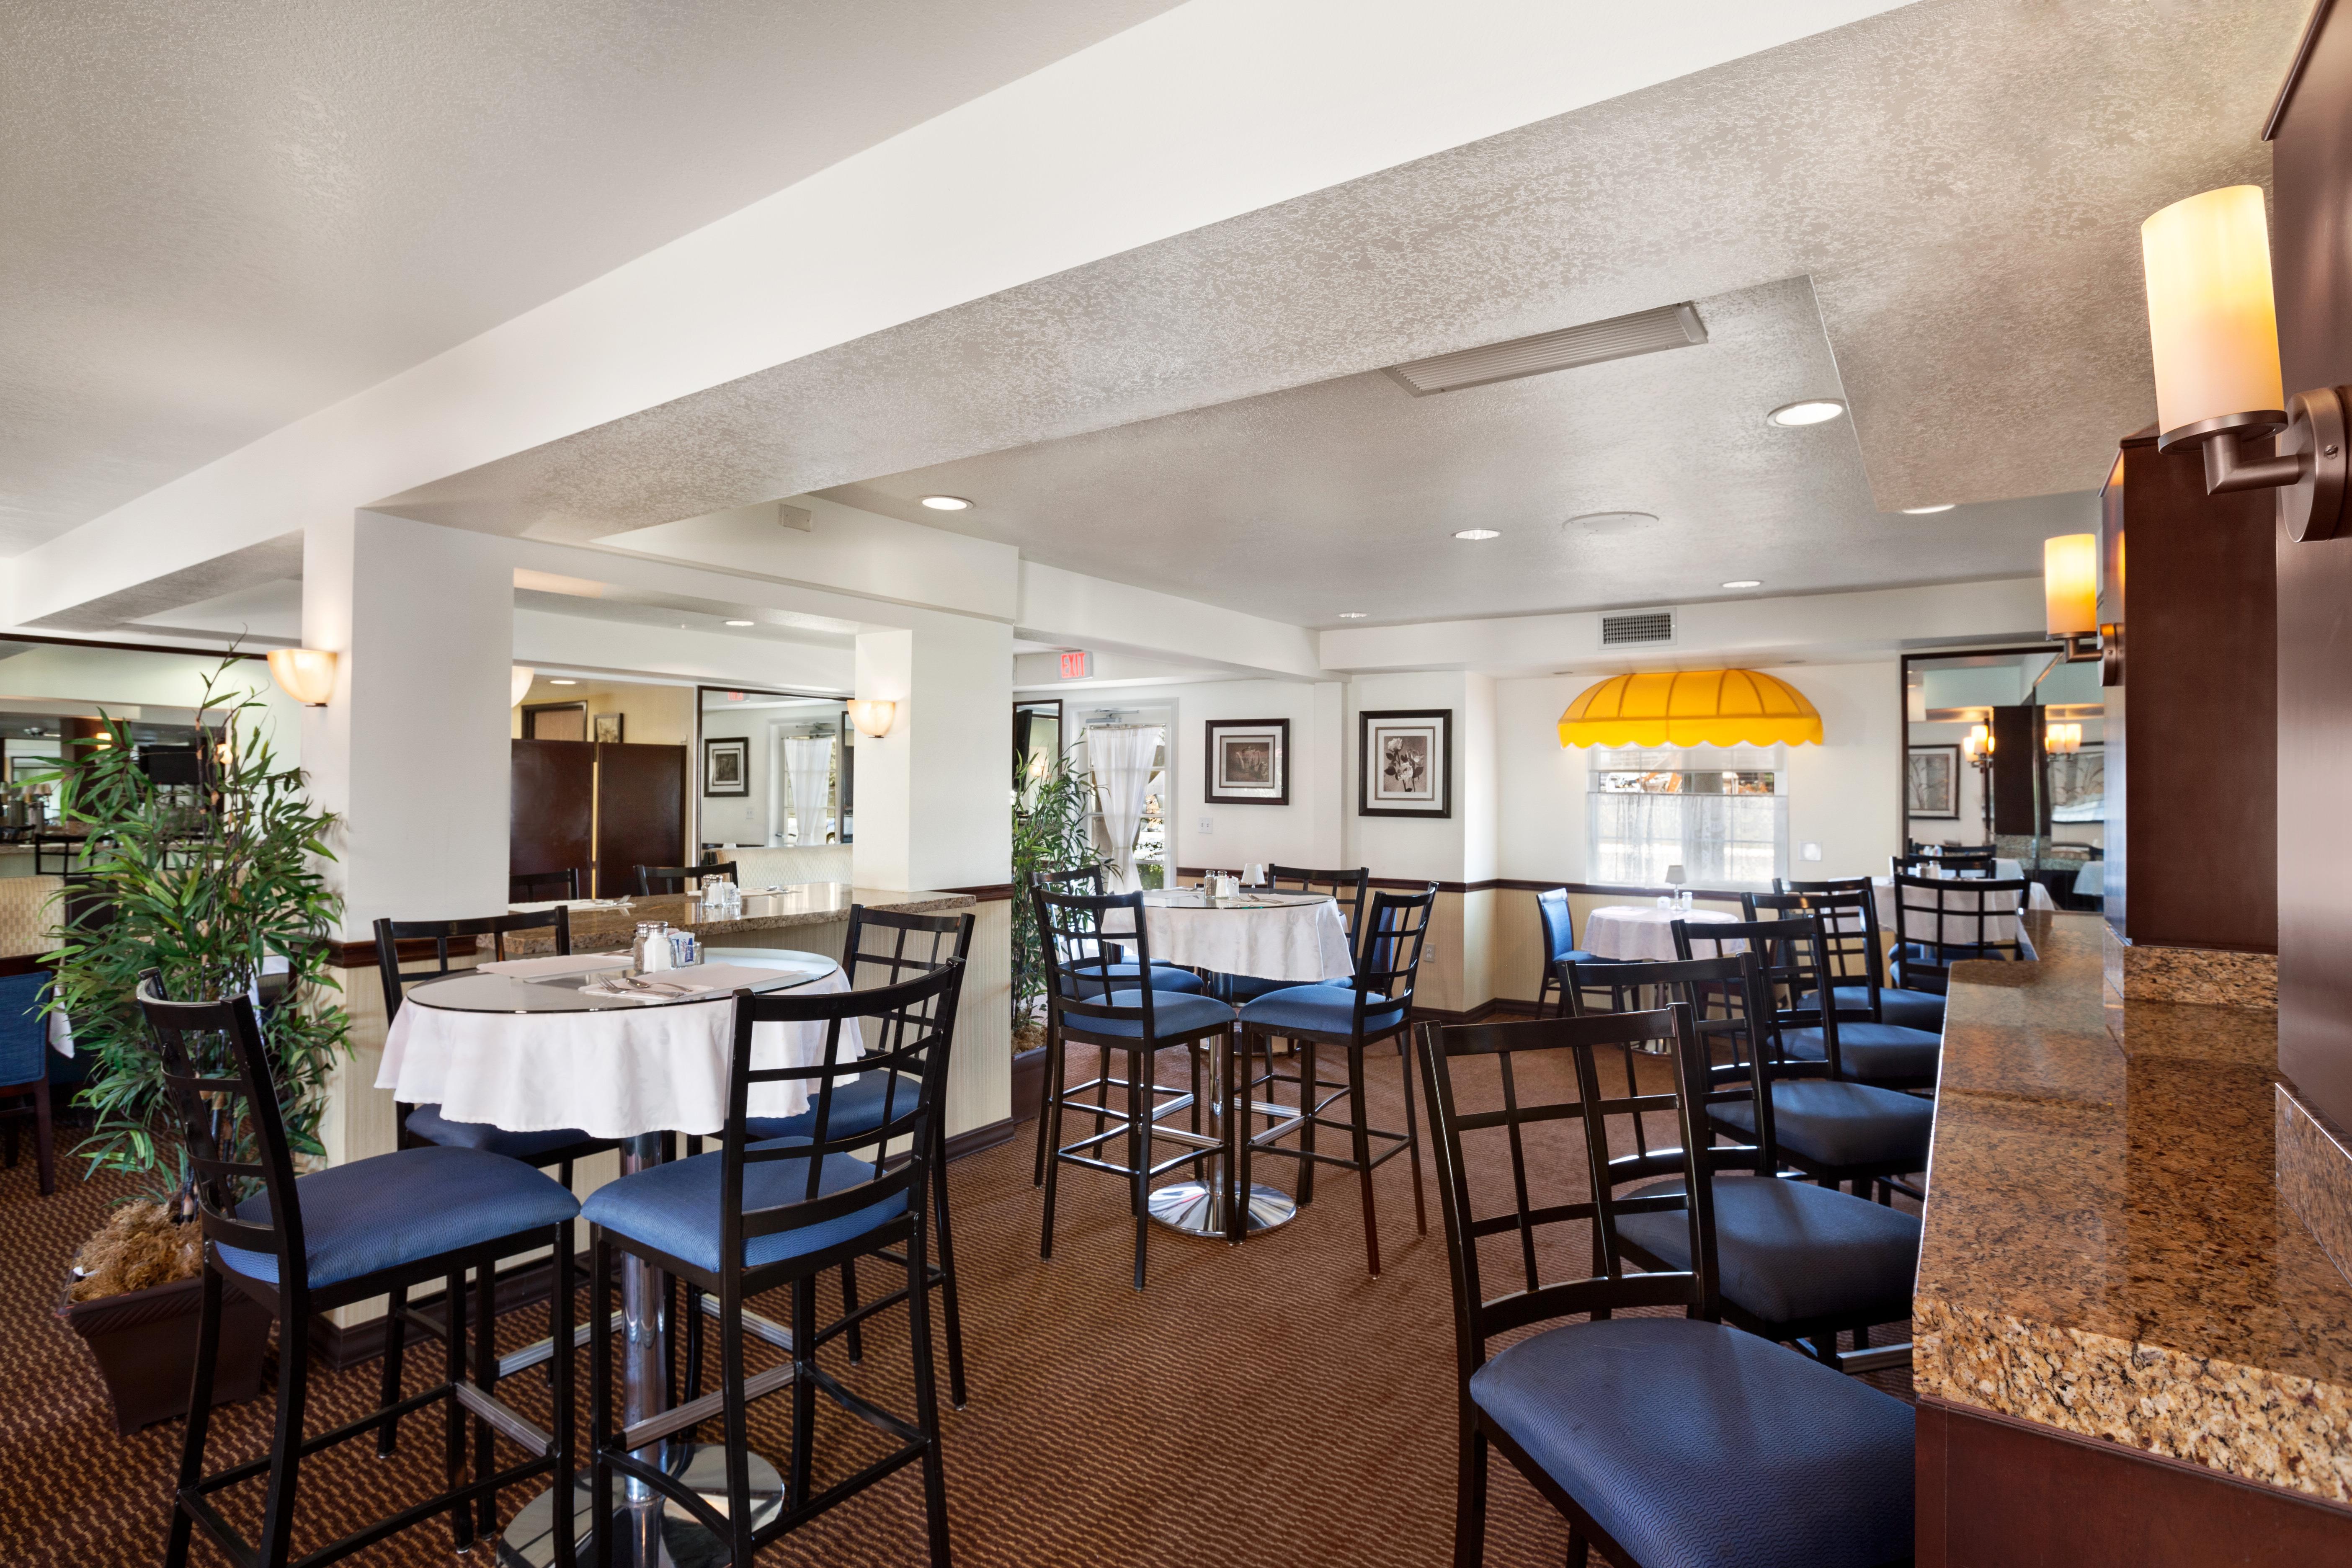 Other Hotel Services AmenitiesRestaurant in Costa Mesa  Newport Beach California. Costa Mesa Dining Room Set. Home Design Ideas